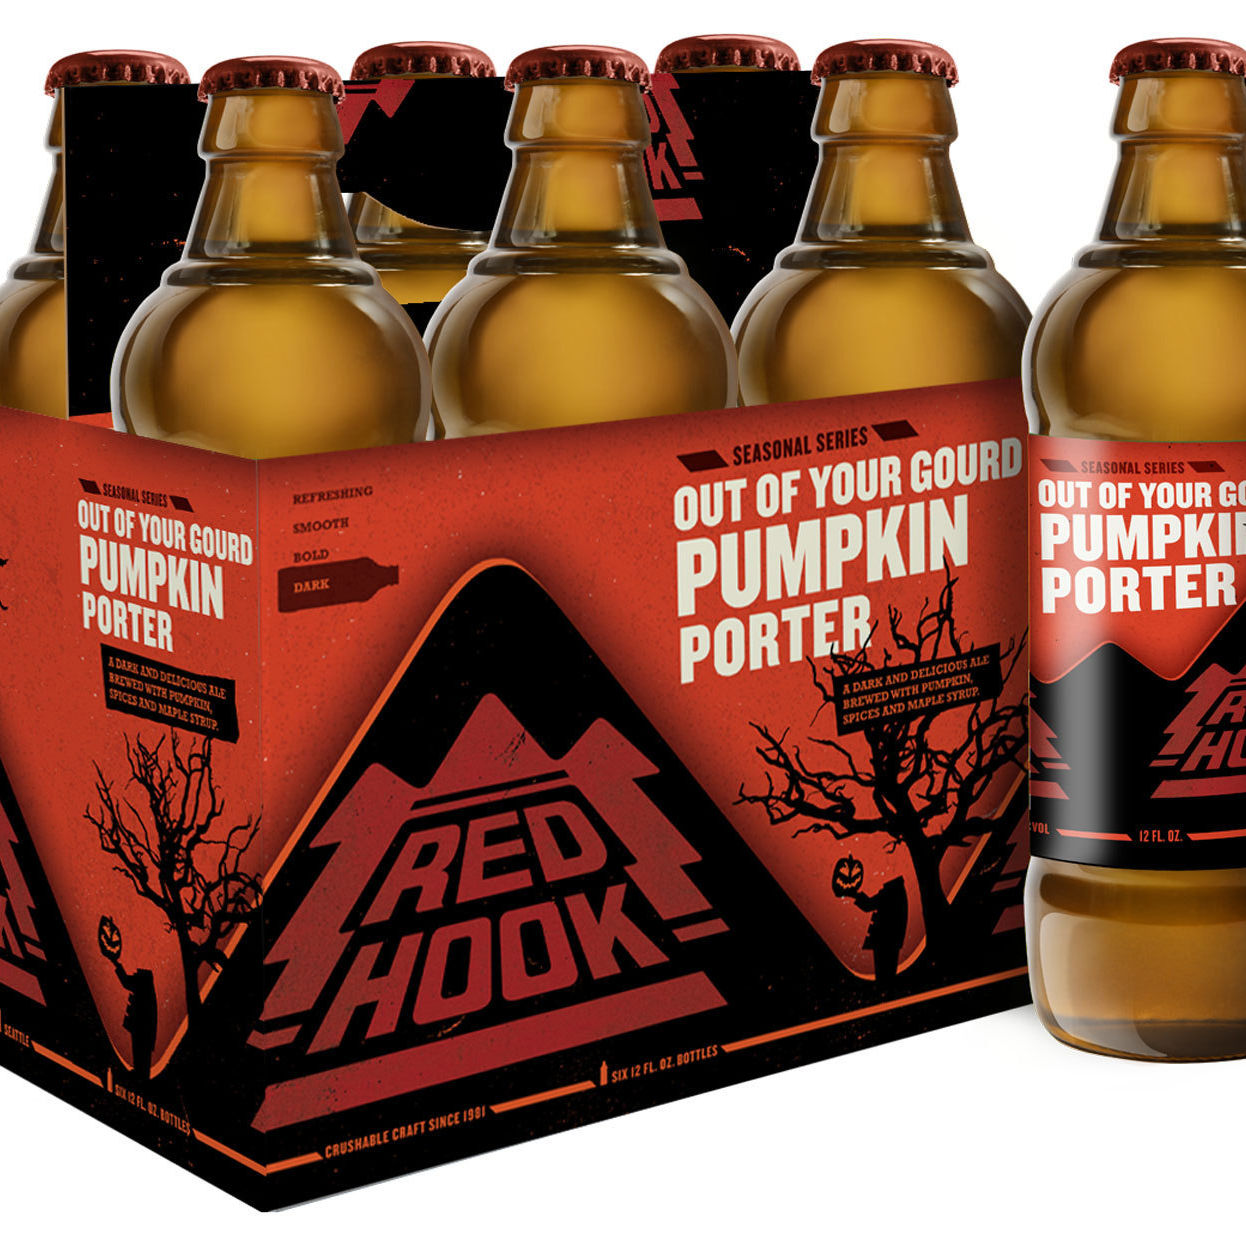 Pumpkin porter dtxb54